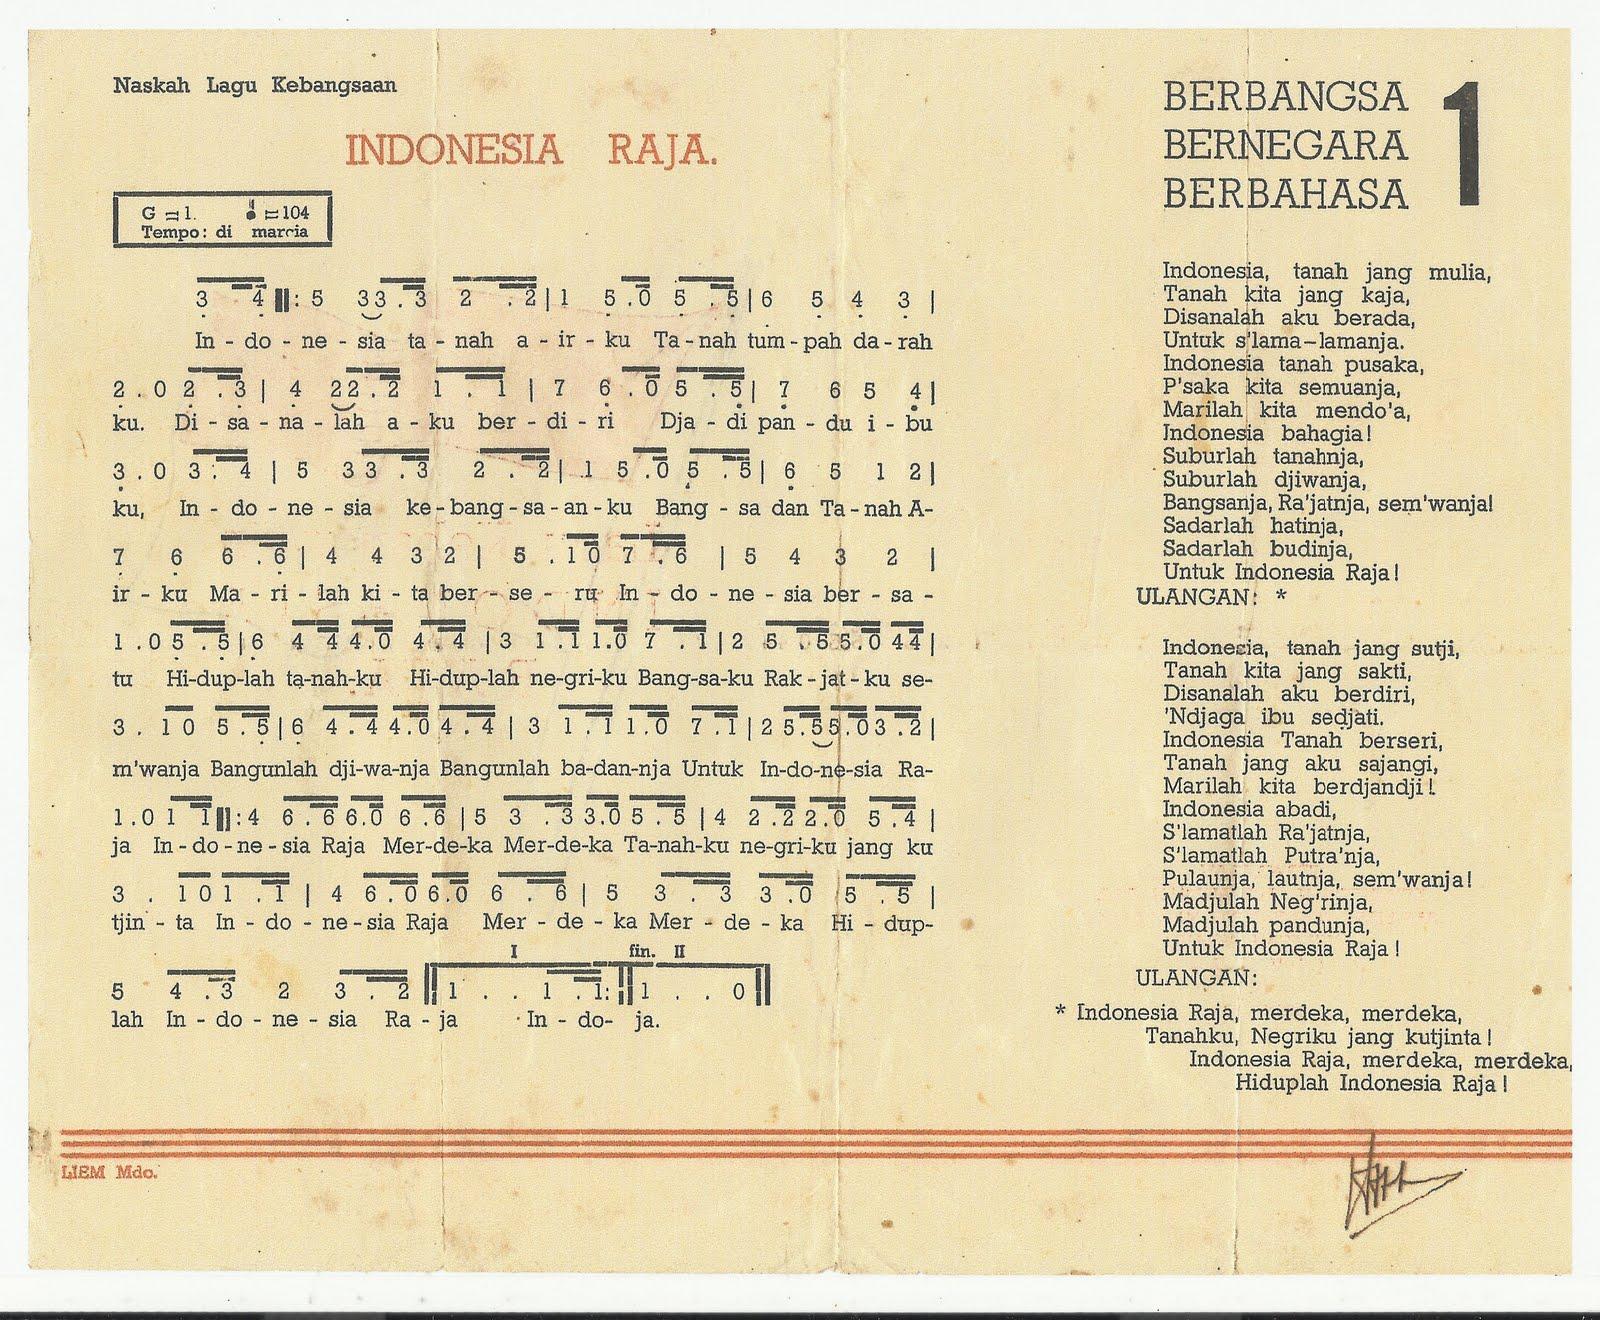 STASION BUKU ANEH-KUNO: NASKAH LAGU INDONESIA RAYA, ASLI